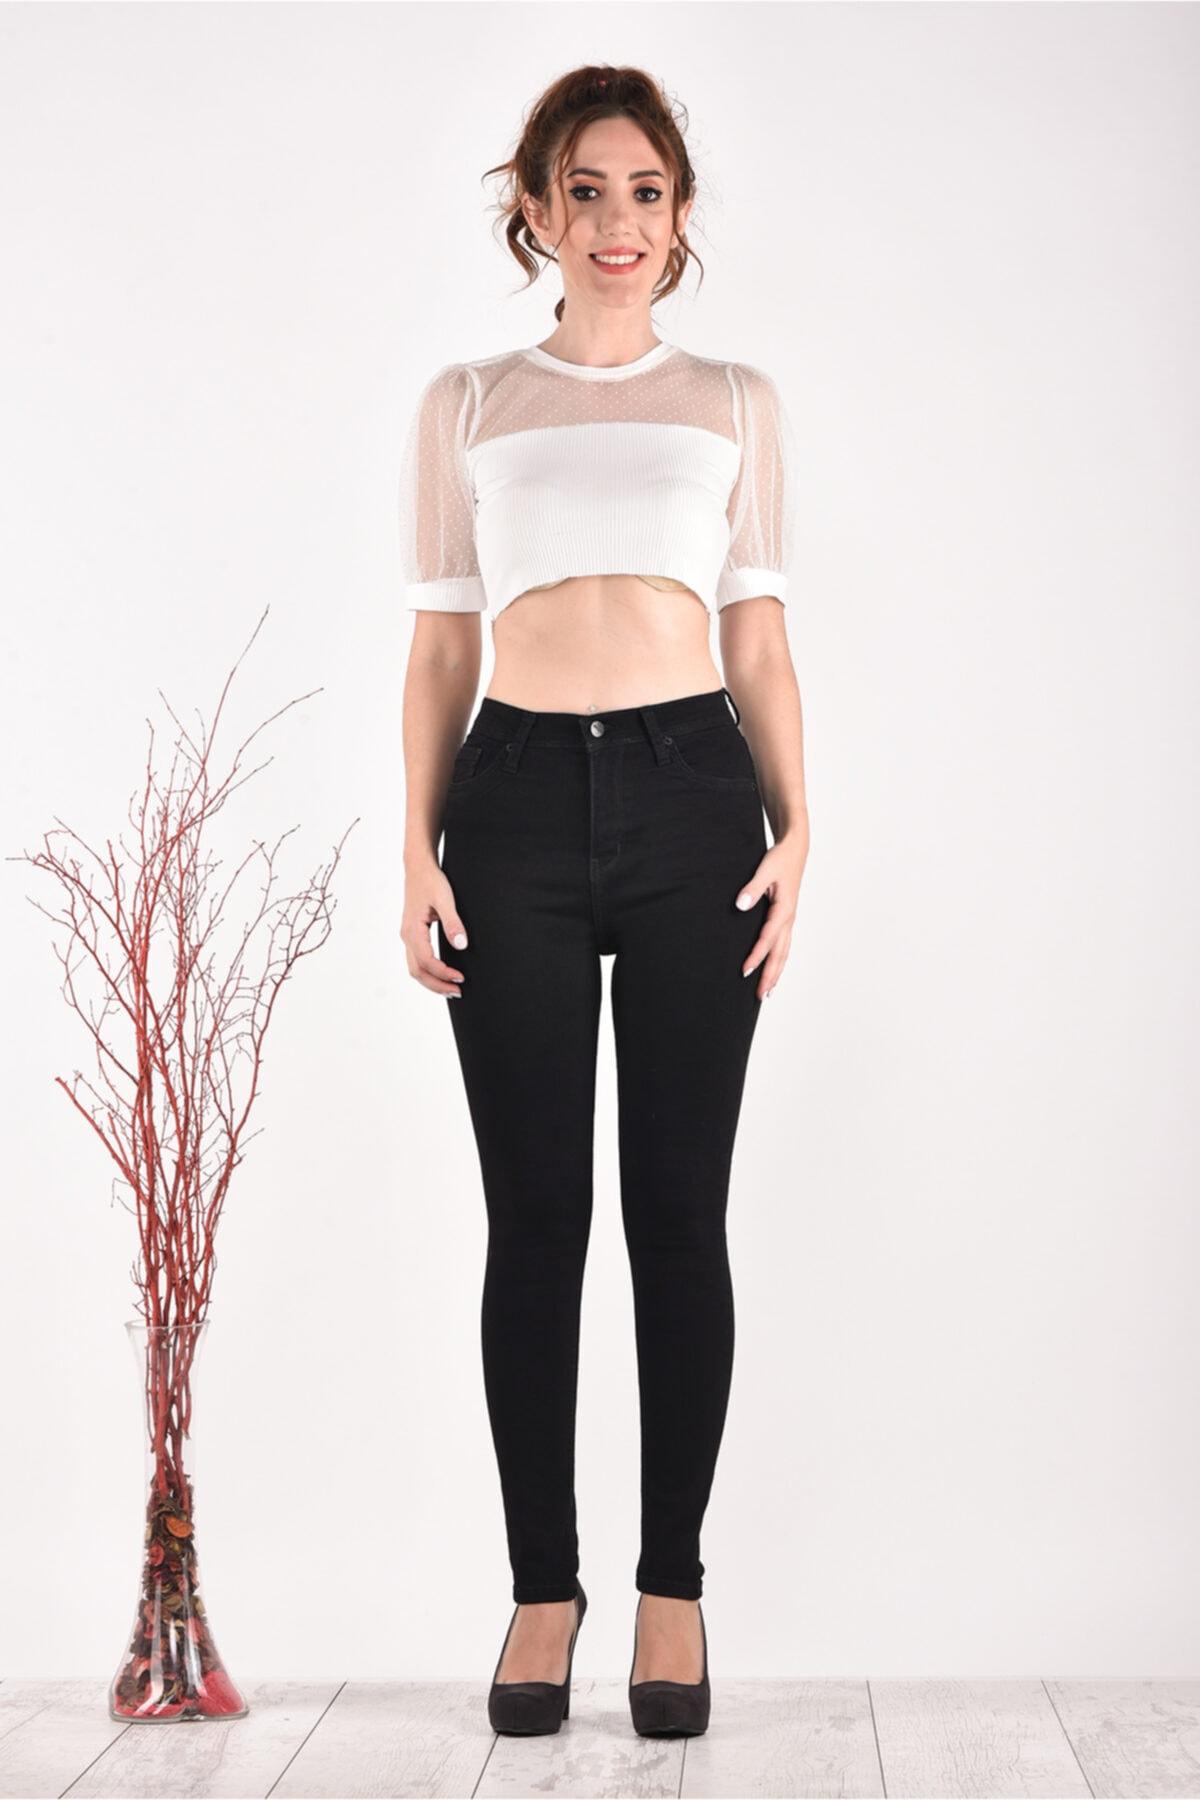 PANTOLOJİ Kadın Yüksek Bel Dar Paça 824 Model Black Bayan Jeans Pantolon 1